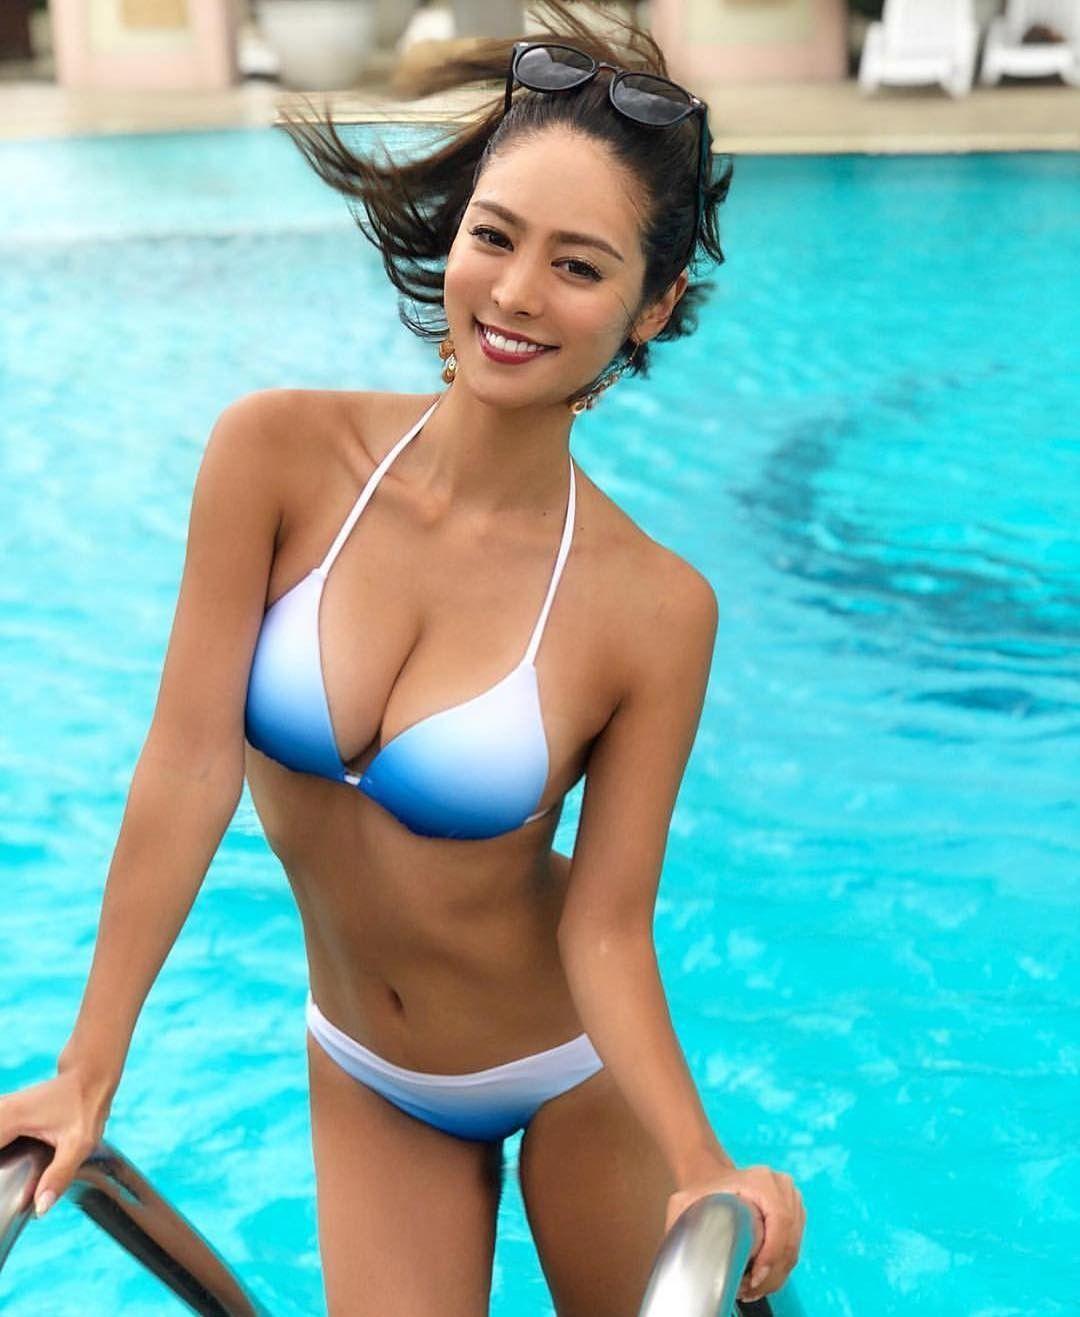 Pin by Lancelot on Simply Asian | Bikini girls, Bikinis